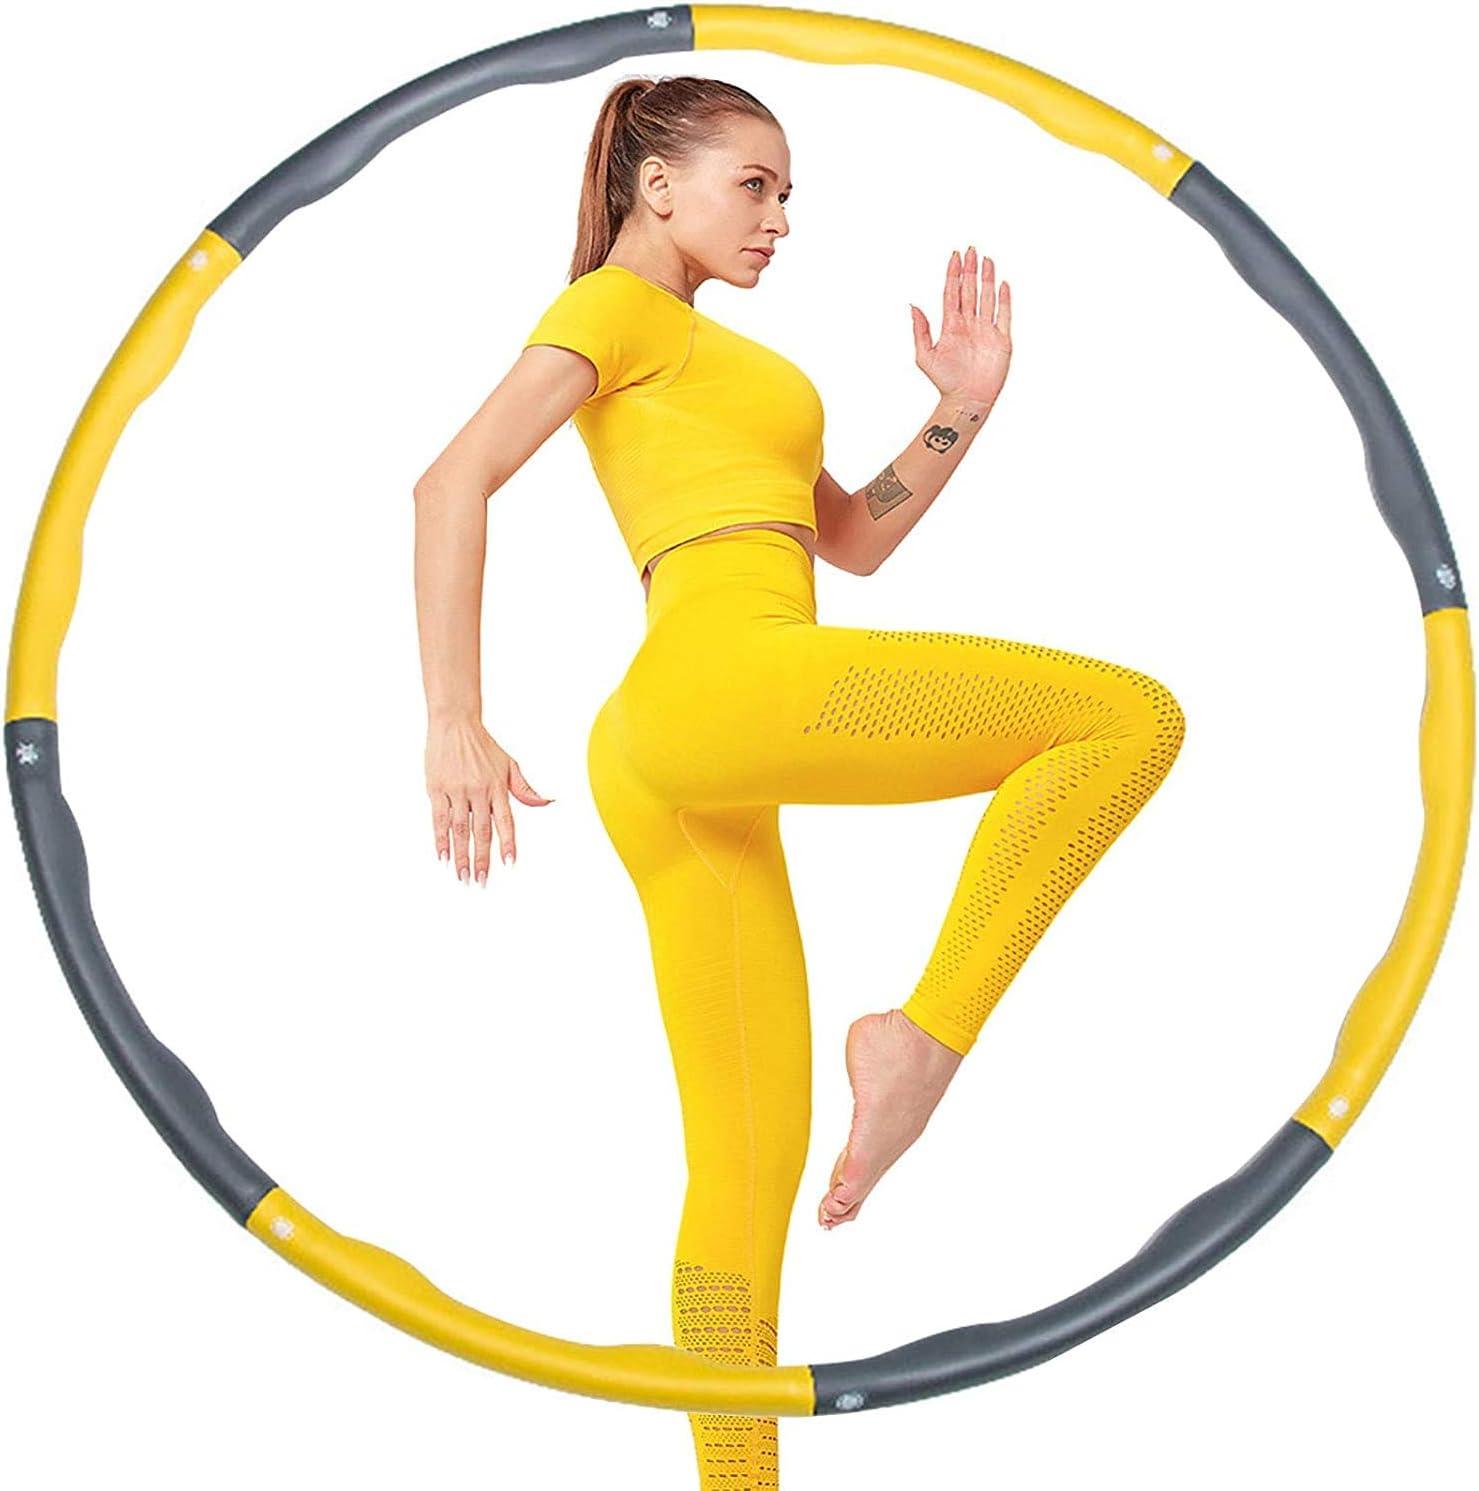 8 Abschnitt Abnehmbares Design Hula Hoop Reifen Erwachsene mit Mini Bandma/ß kommt Gkodeamig Hula Hoop Reifen Zusammenklappbare /& Einstellbare Fitness Ubung Hula Hoop